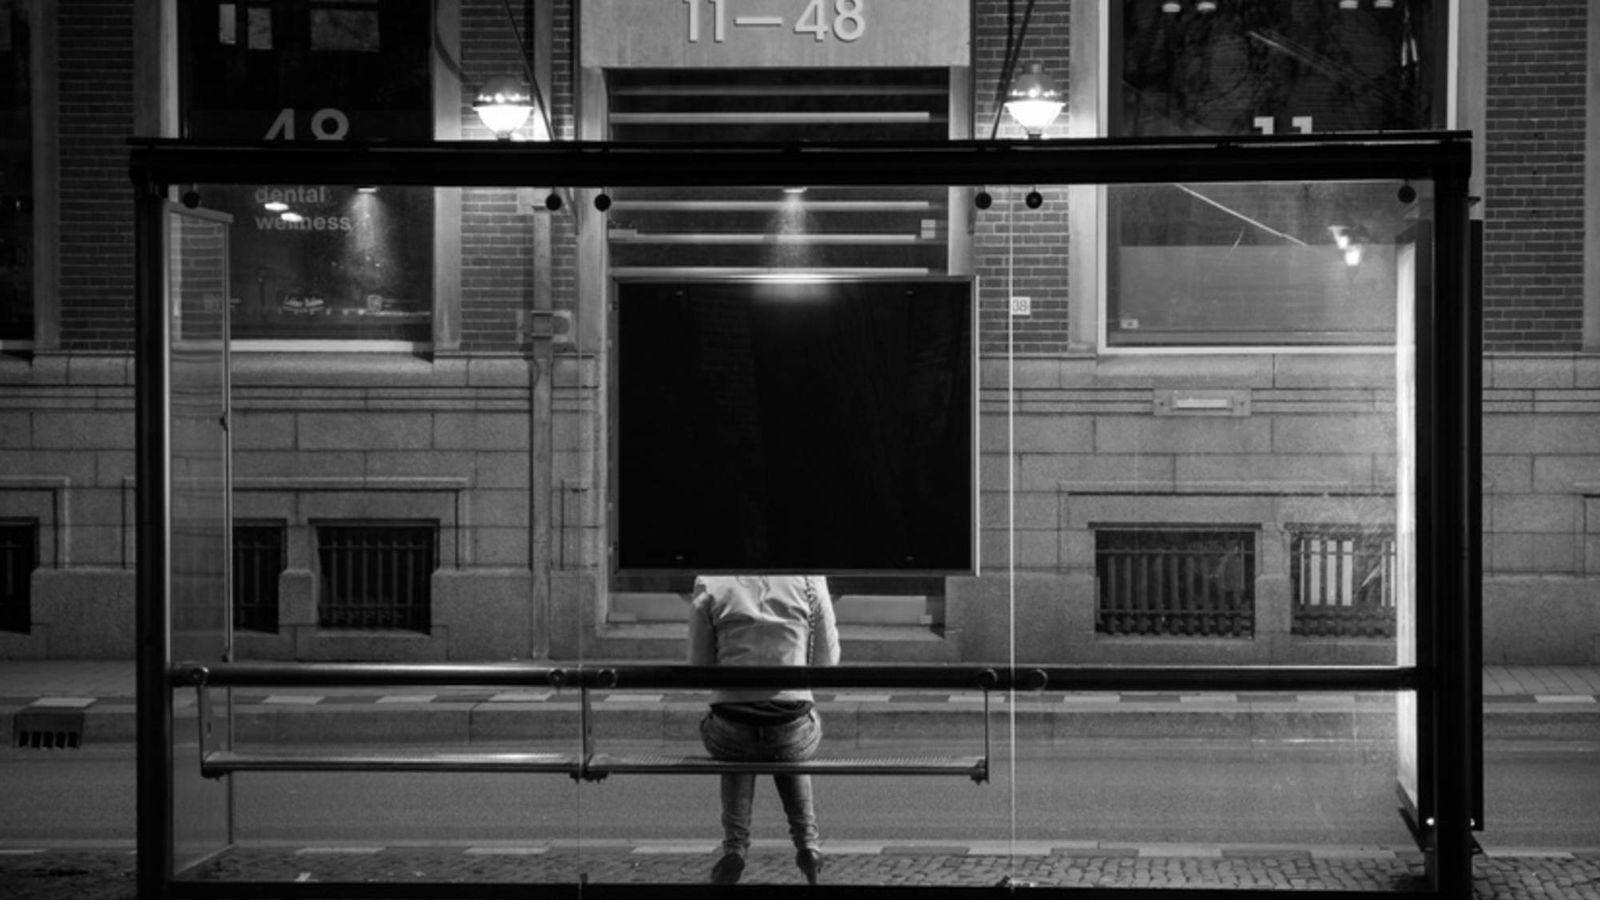 Foto: Una mujer espera el autobús sentada en una marquesina.